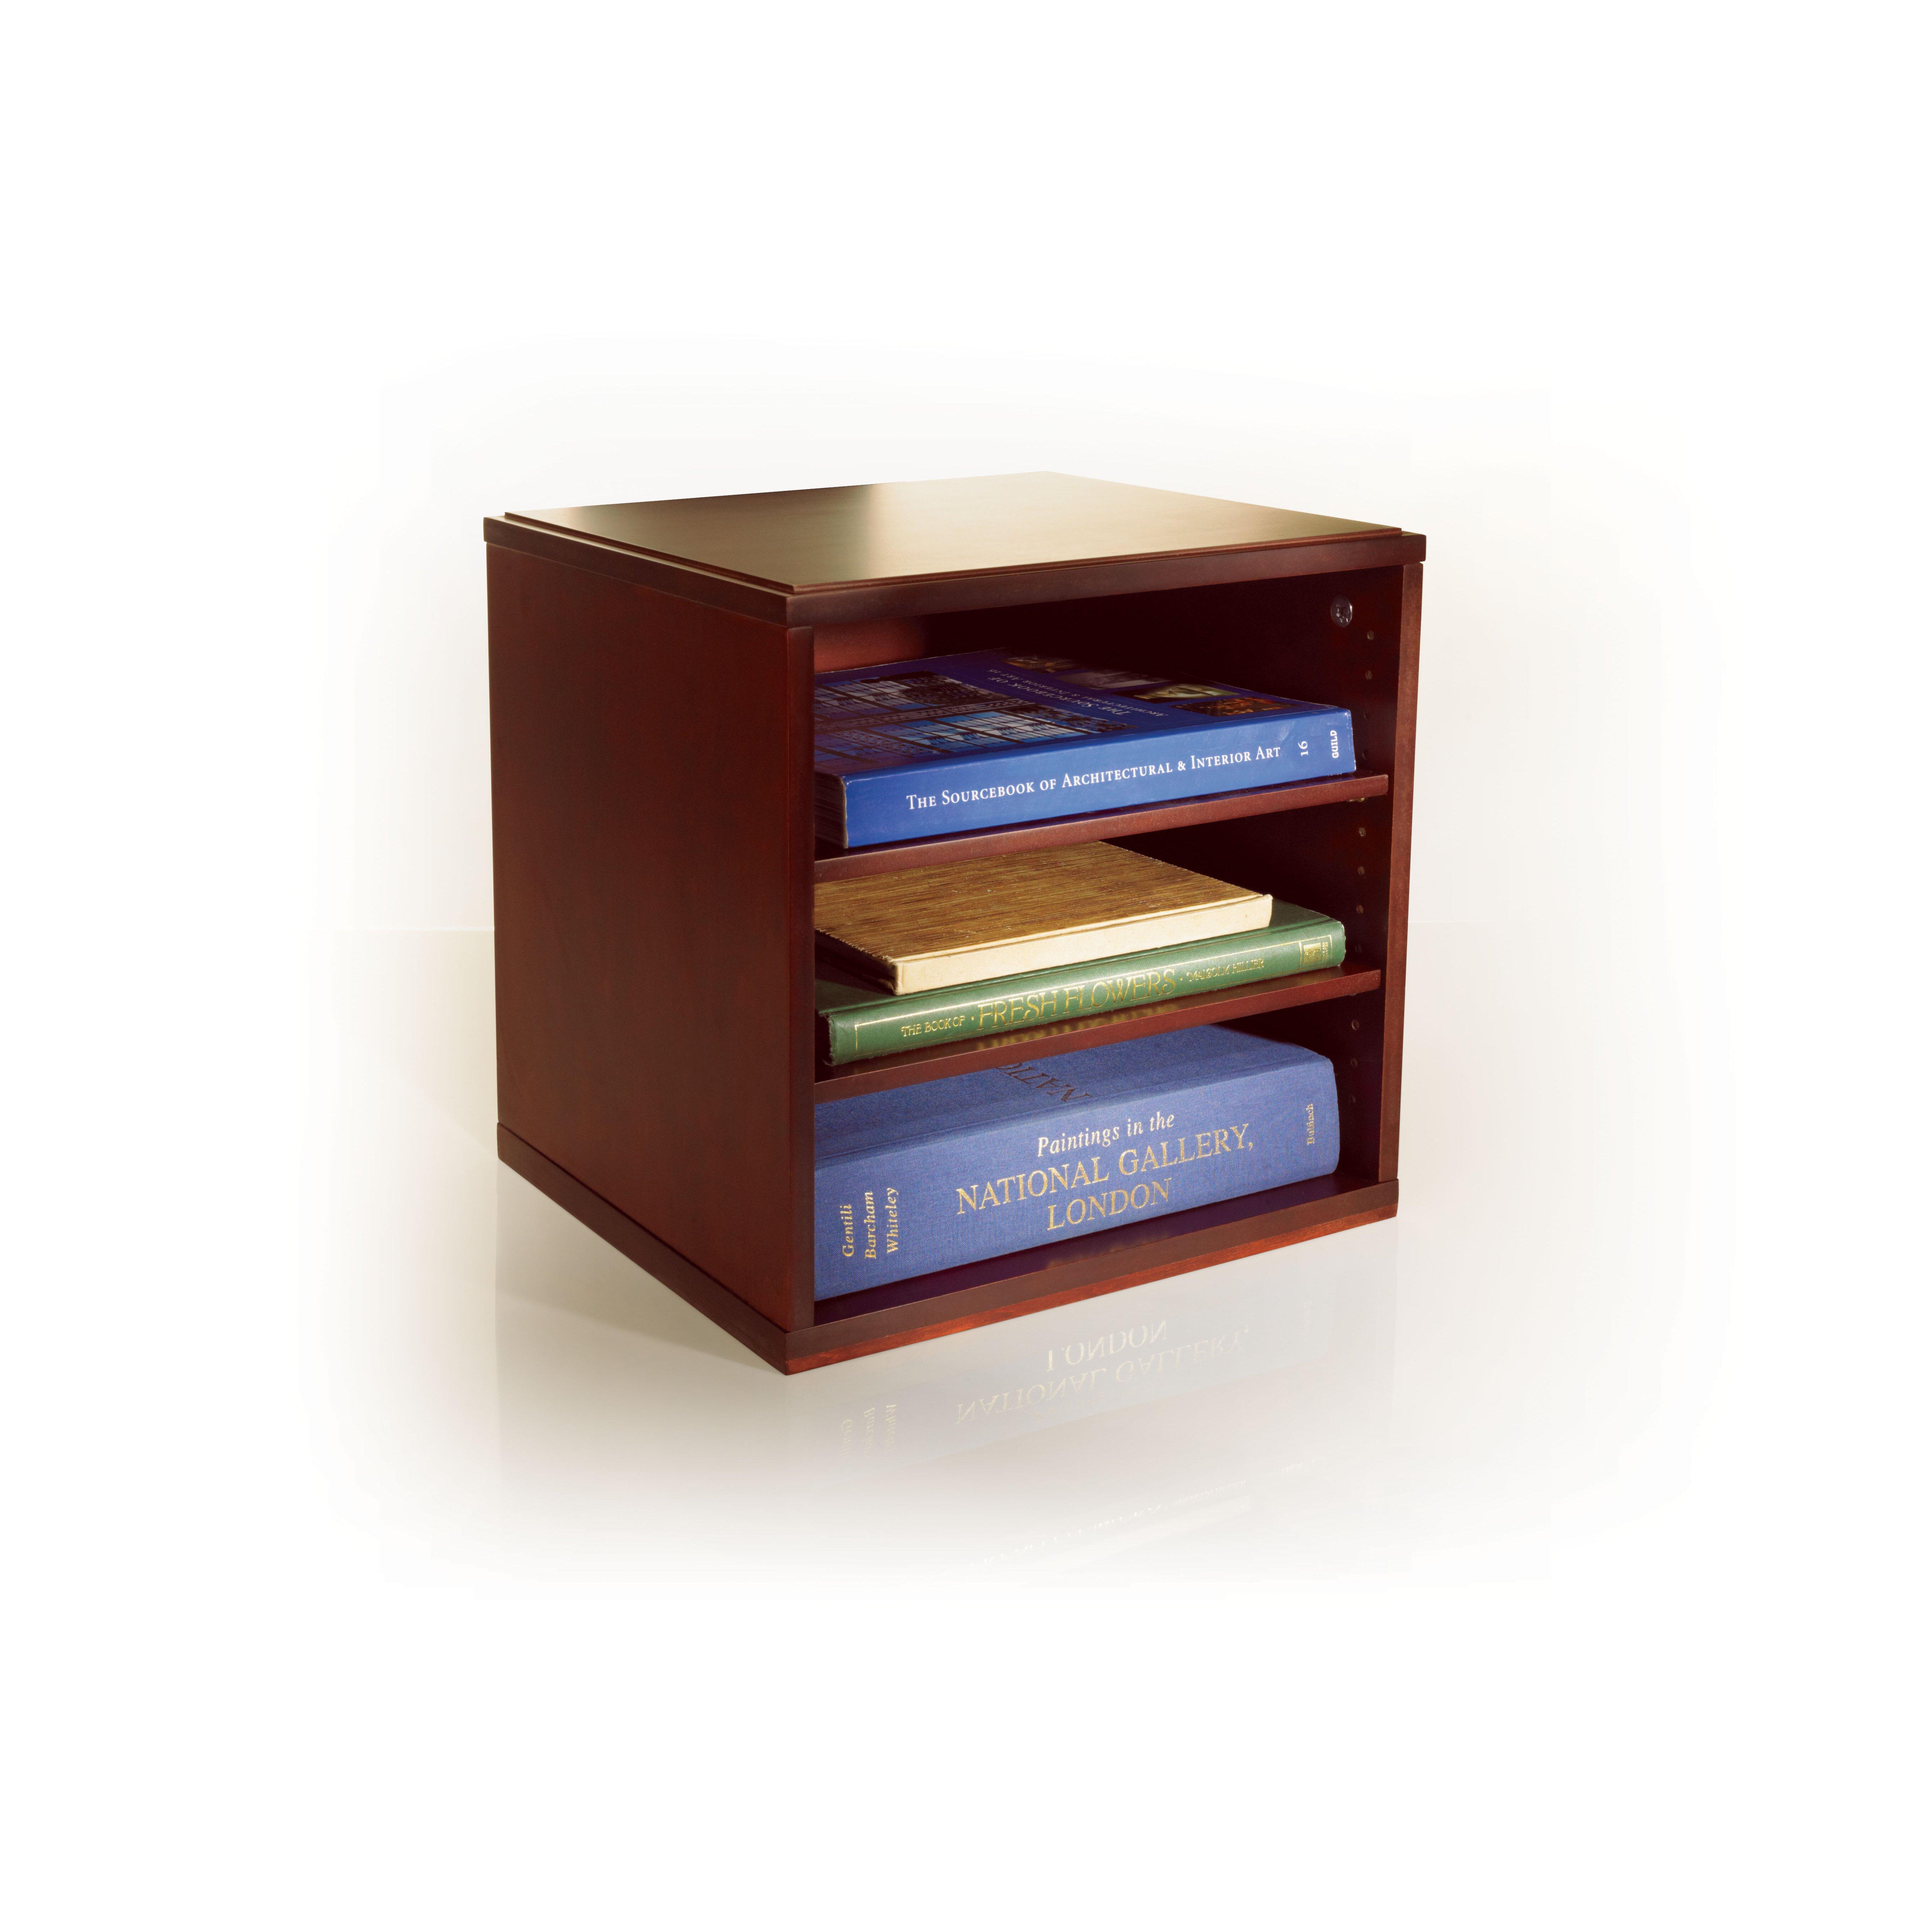 Bindertek Stacking Wood Desk Organizers Cube With Shelves